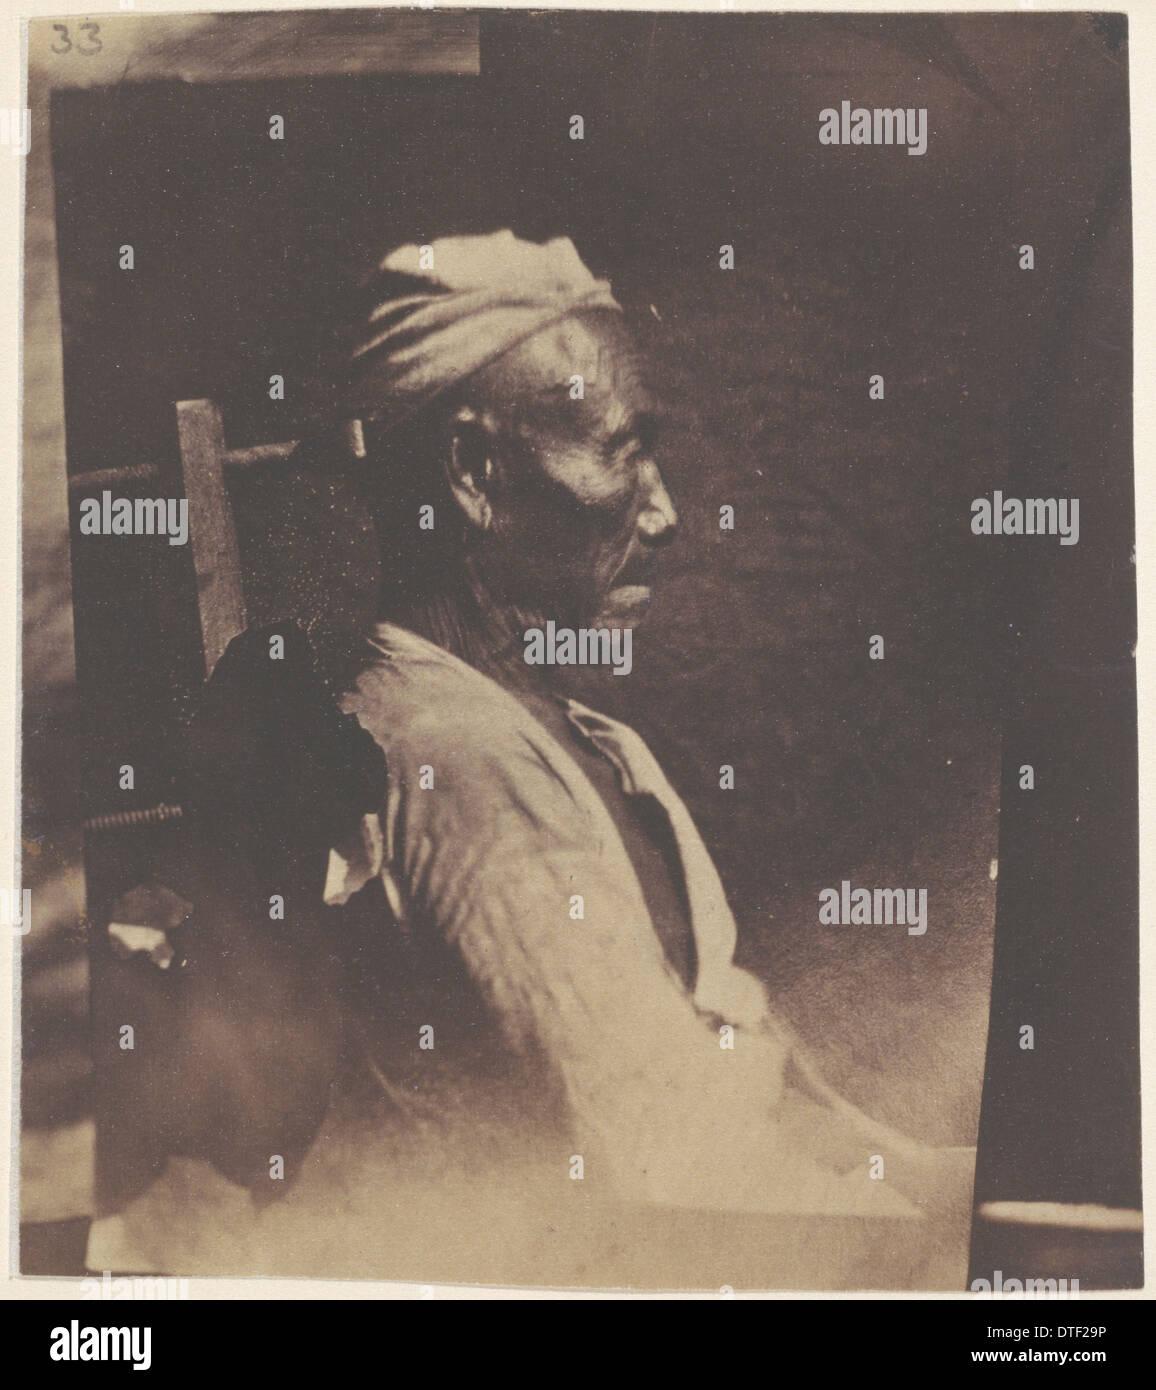 A Hayu or Vayu of Nepal, age 60, c.1840 - Stock Image